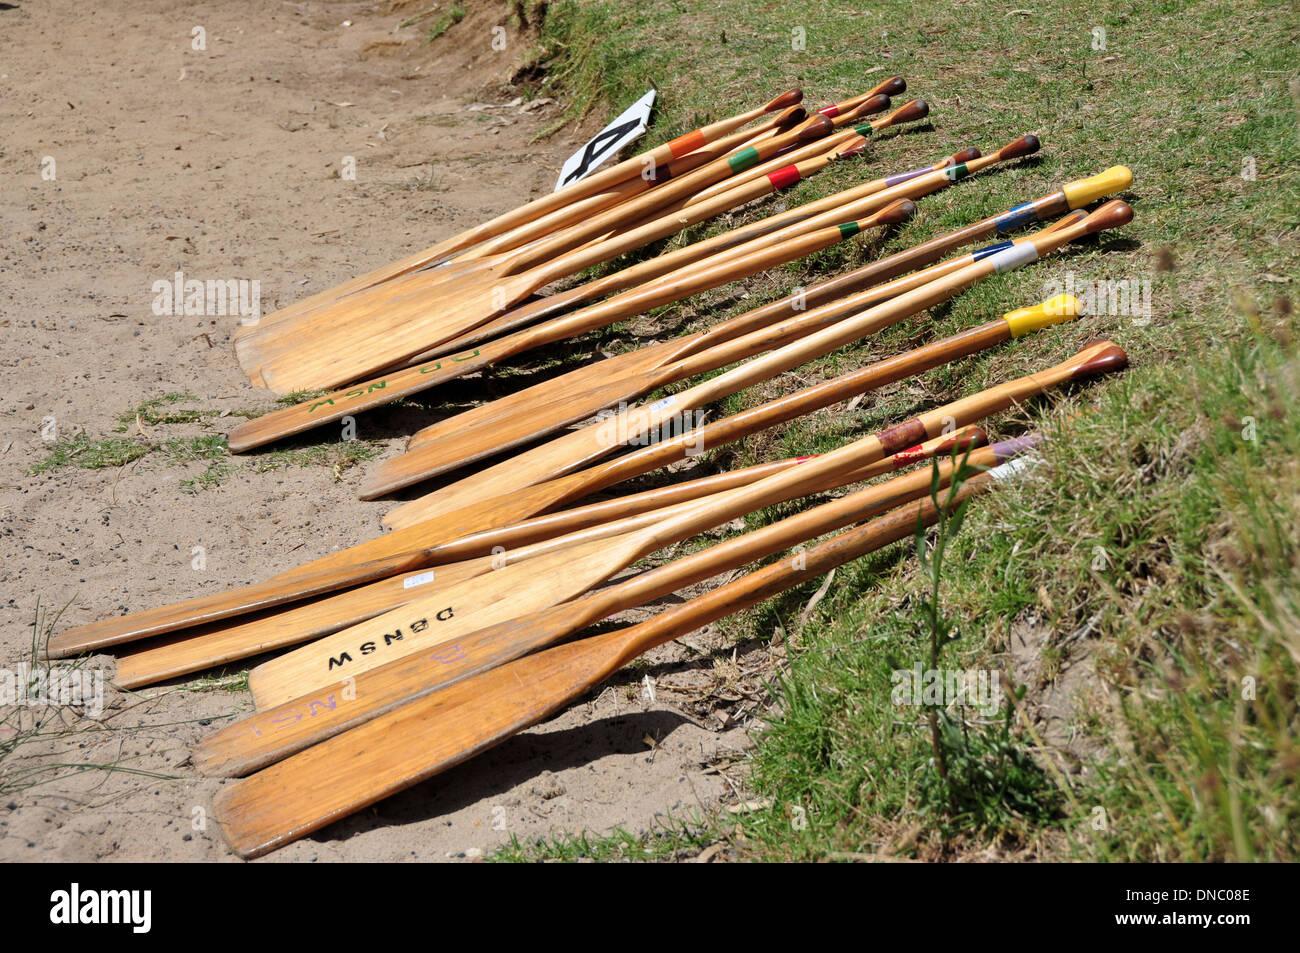 Chinese Dragon Boat Races Oars place on Lake Bank - Lake Albert New South Wales Australia - Stock Image